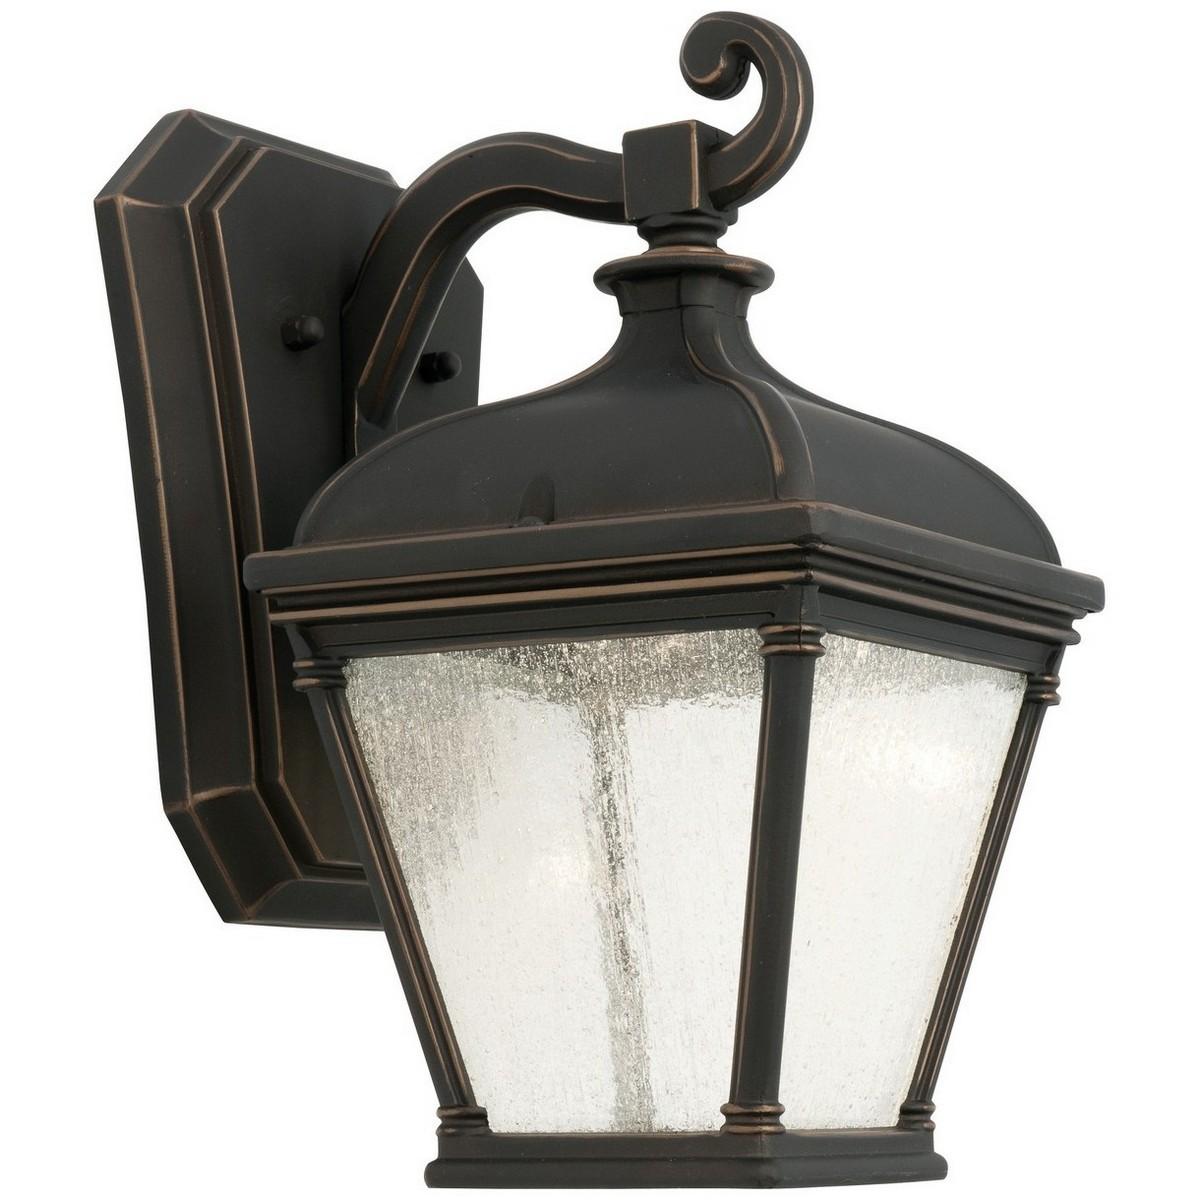 Austin Exterior LED Wall Lantern, Small